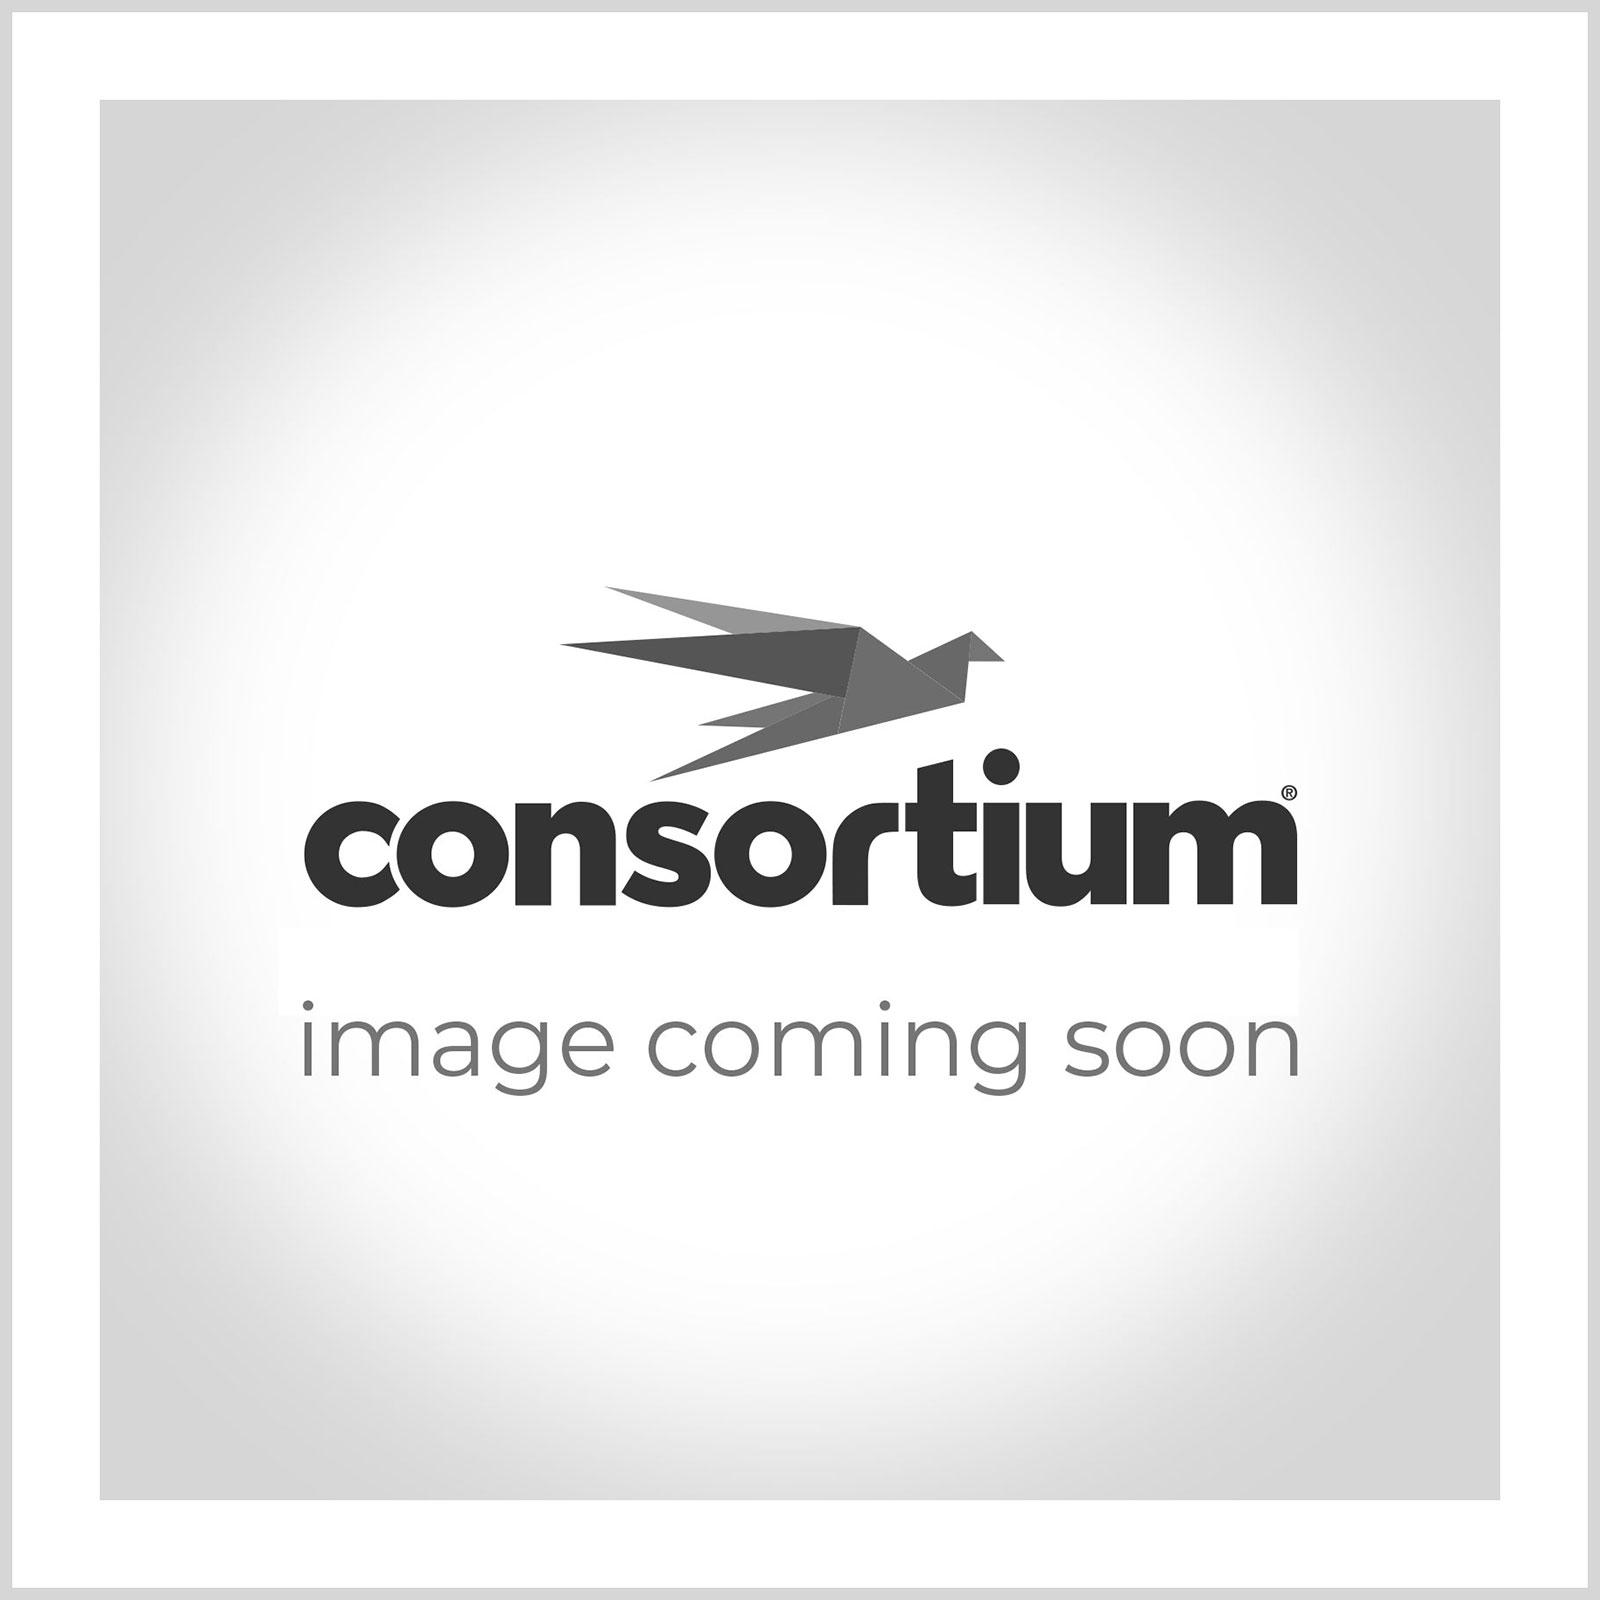 Daler Rowney FW Acrylic Inks